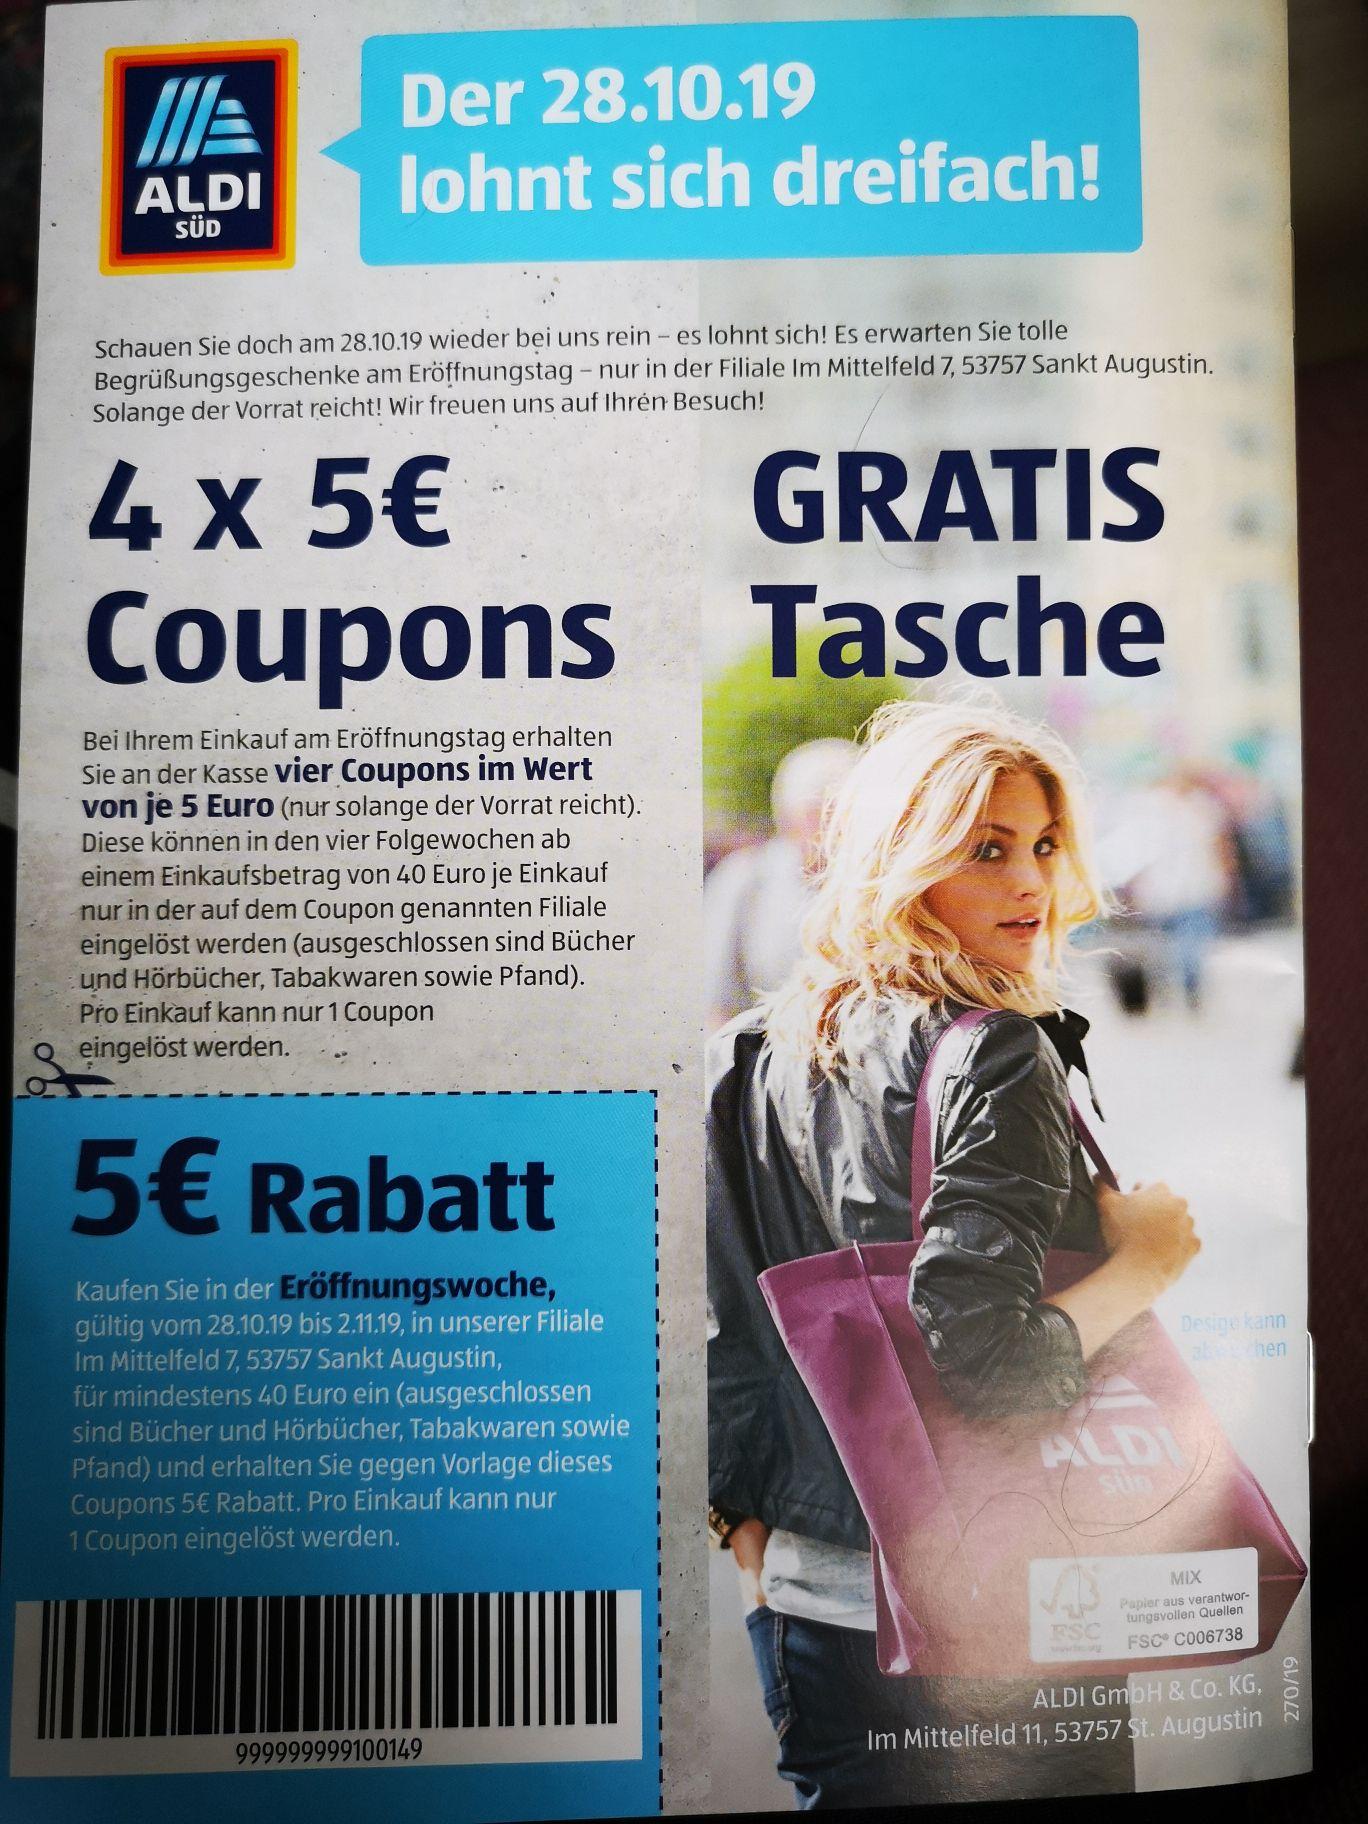 (Lokal Sankt Augustin) [Aldi Süd] Coupons 4 x 5€ am 28.10.19